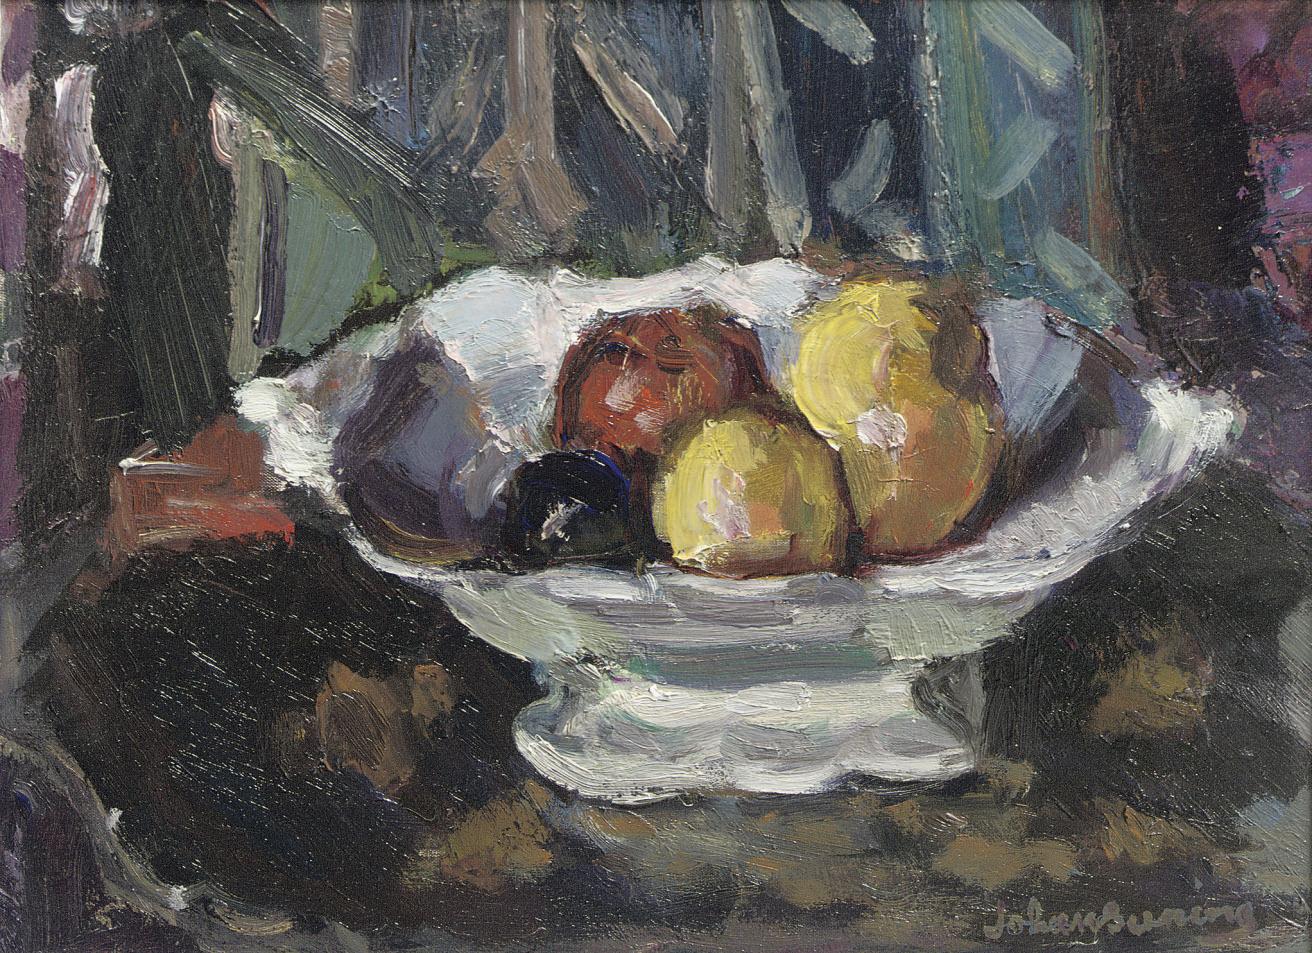 Johan Buning (1893-1963)